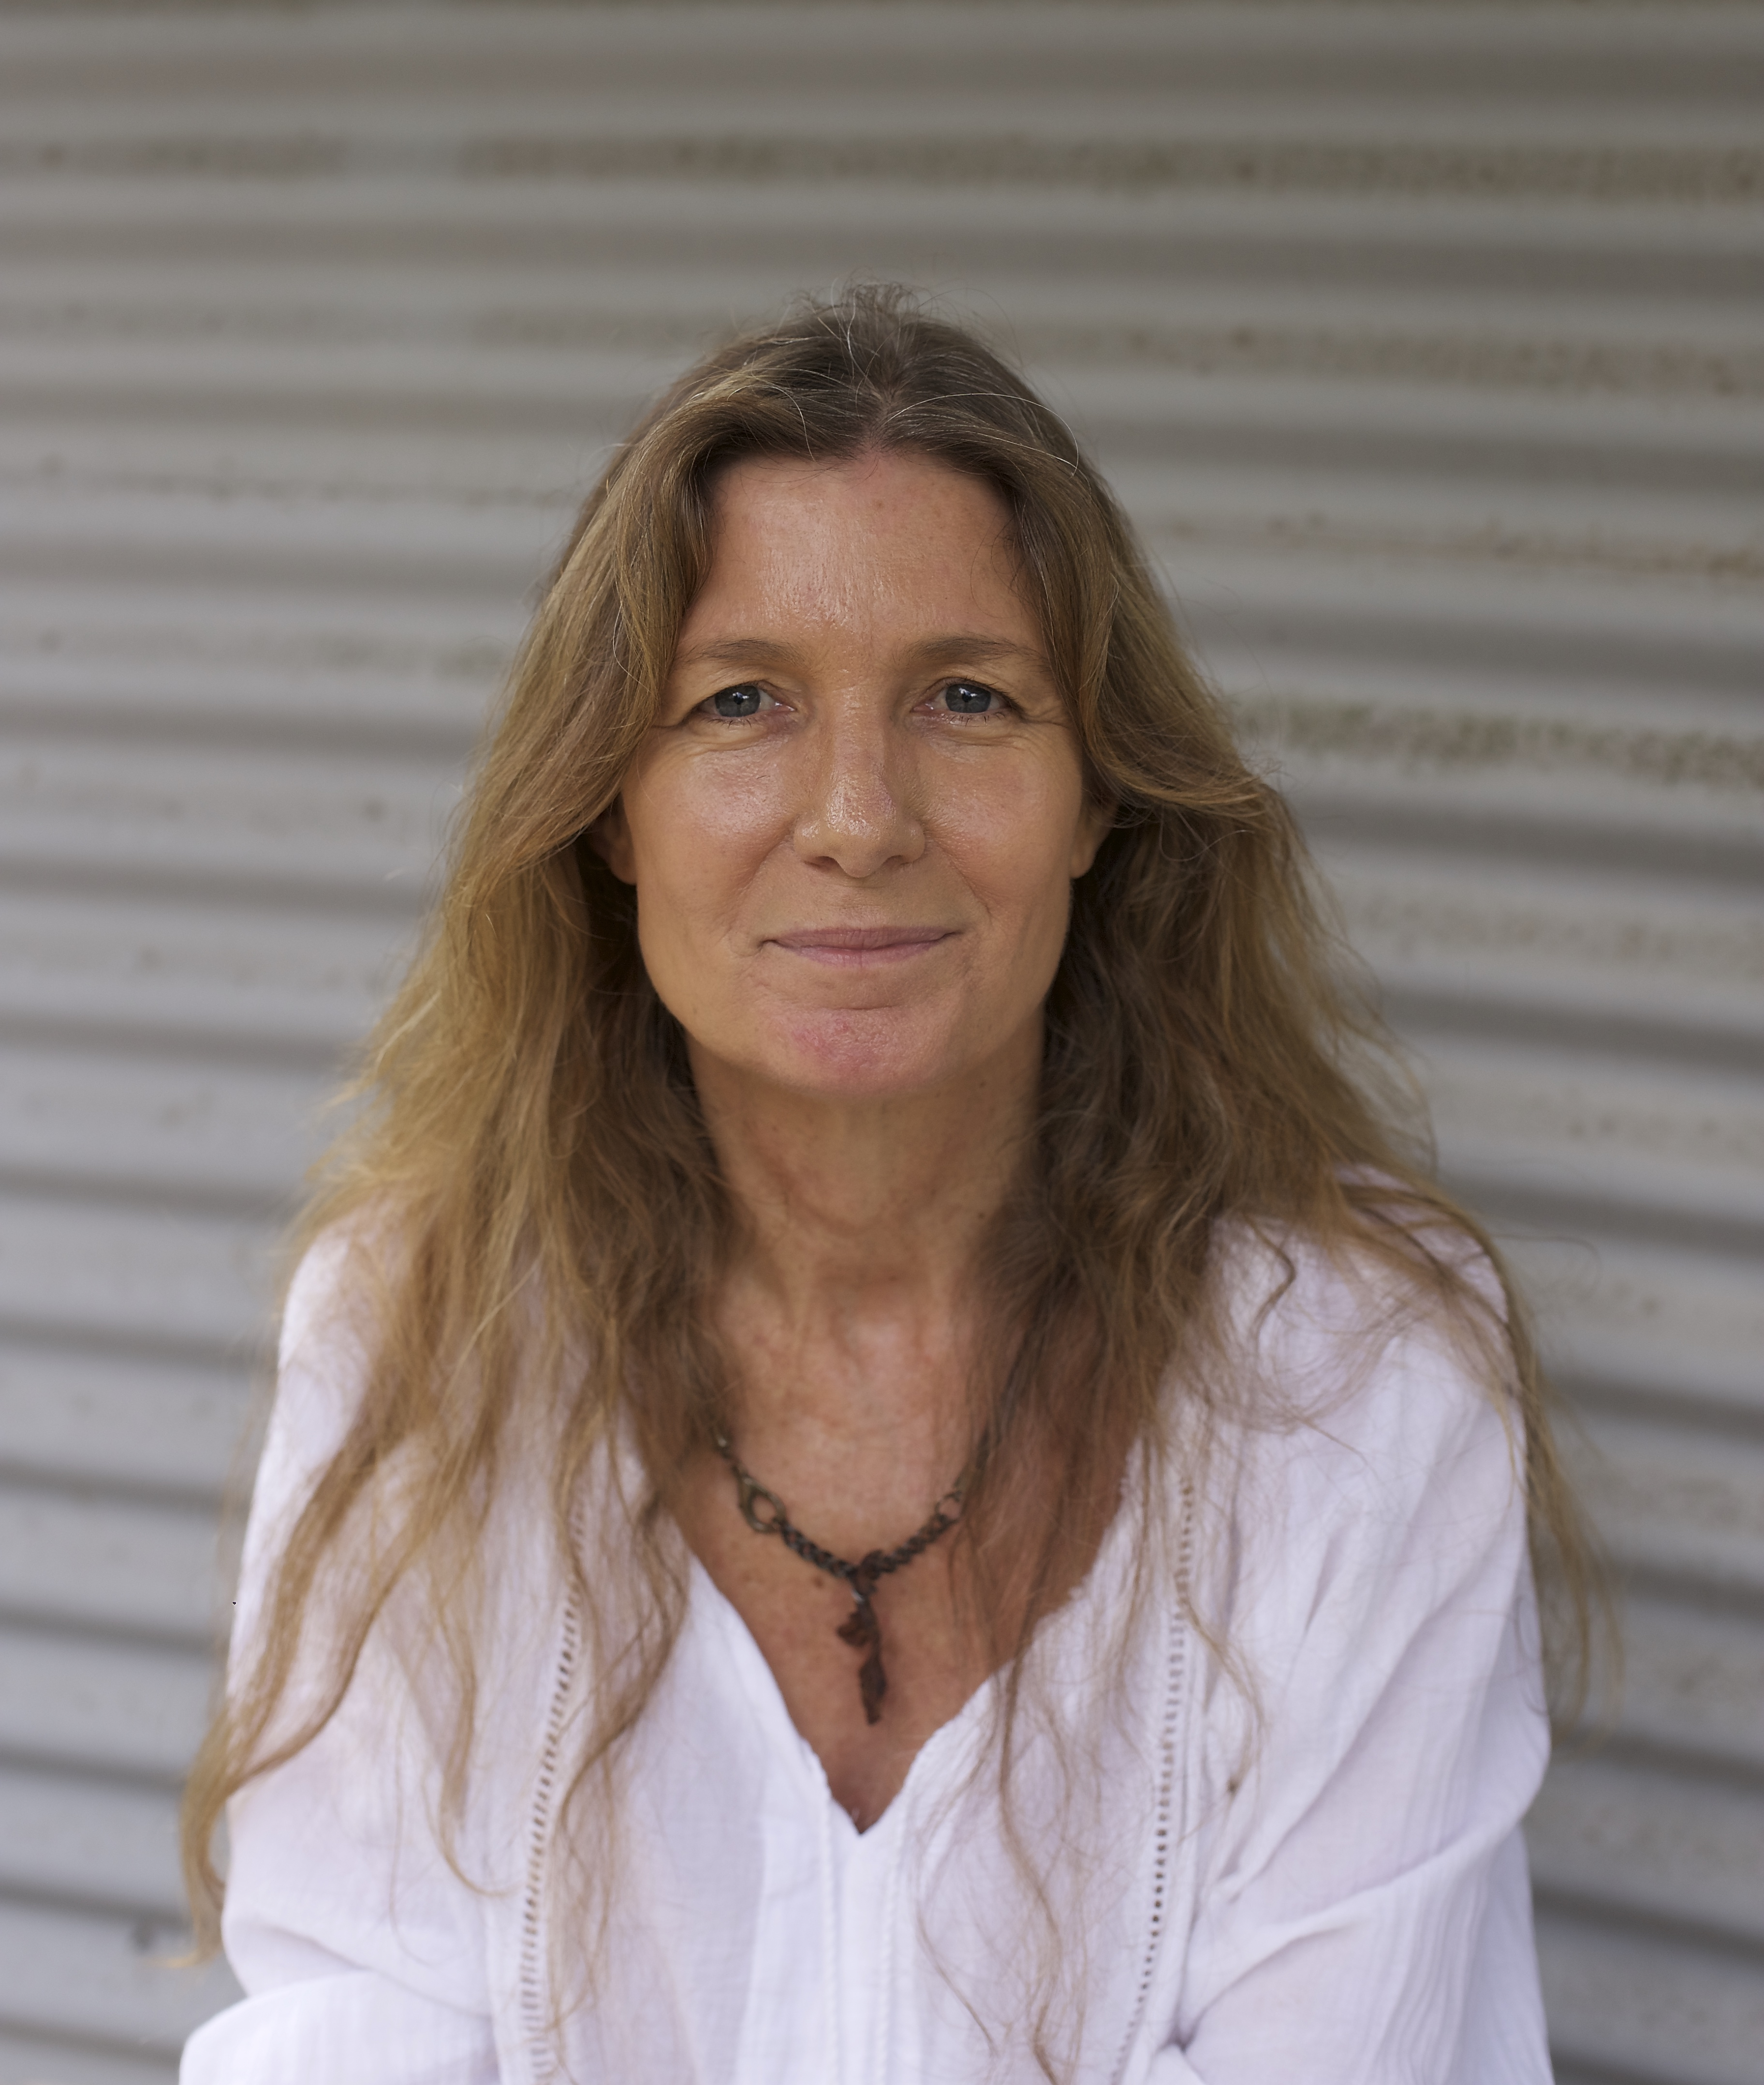 Portrait image of Dana Kai Bradford